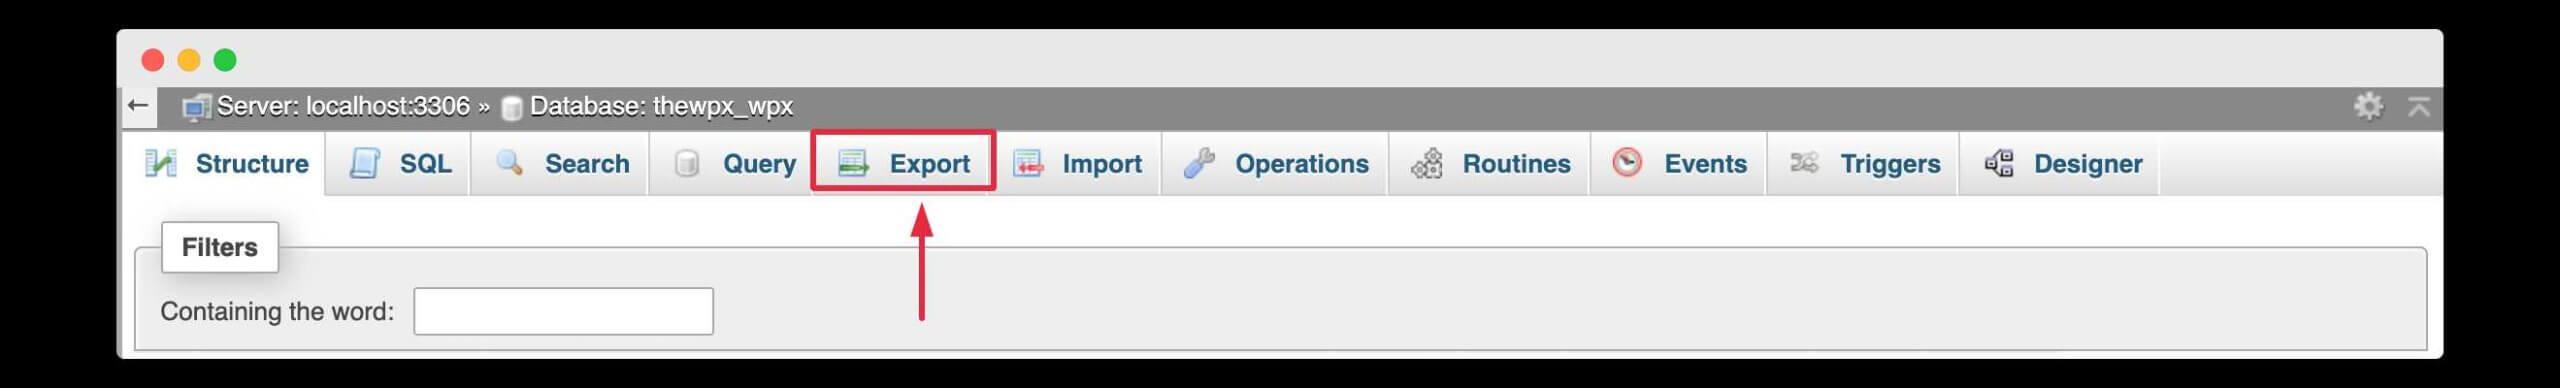 exporting database using phpmyadmin